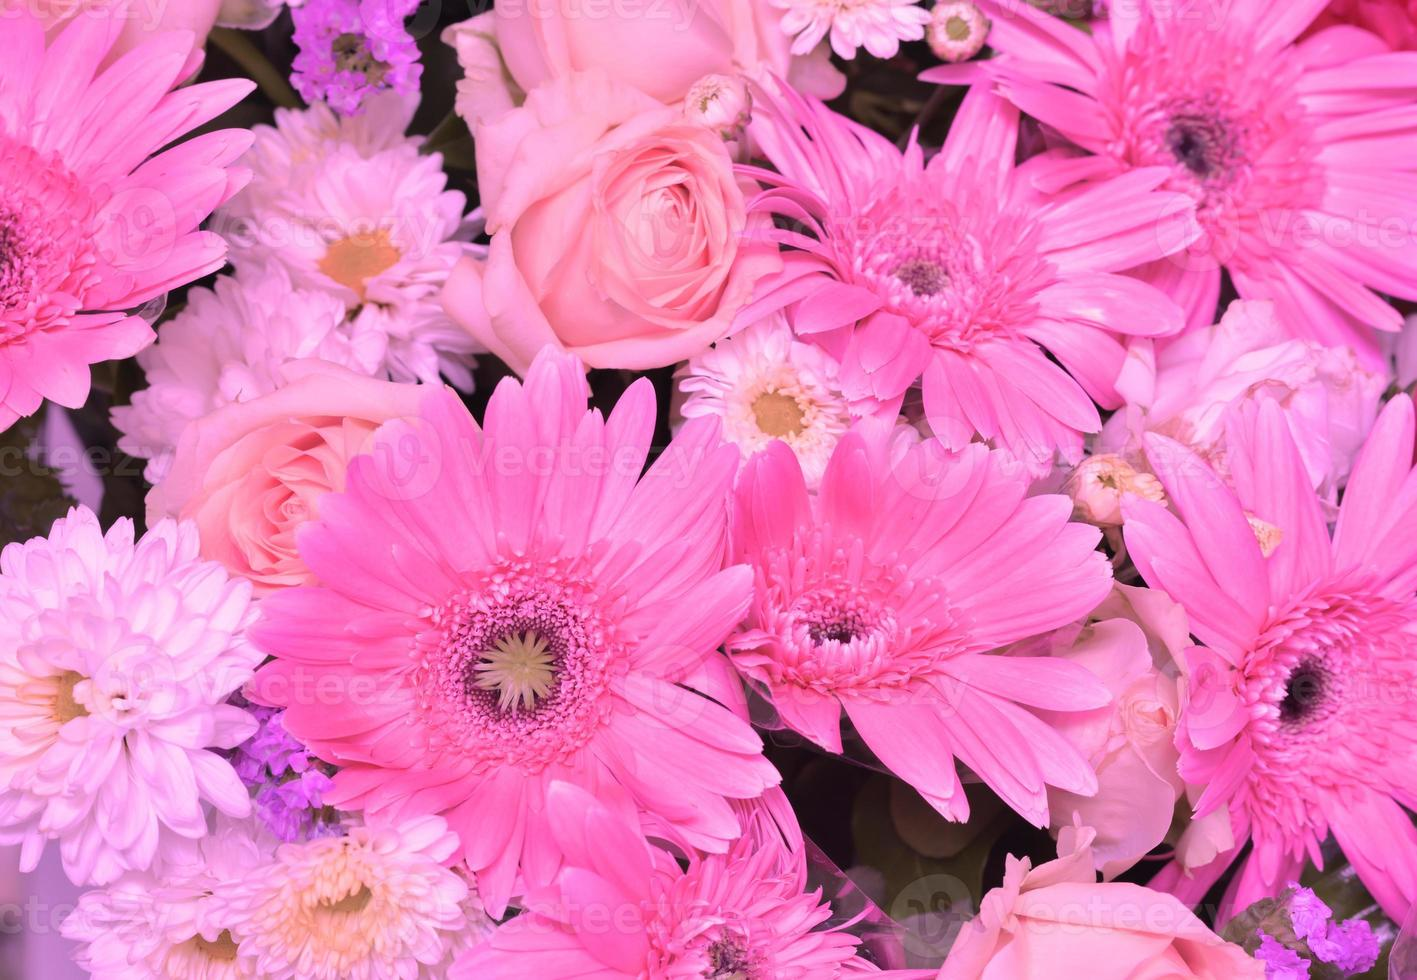 ton rose de fleurs variées, gerbera, lis, roses, fond nature chrysanthème photo